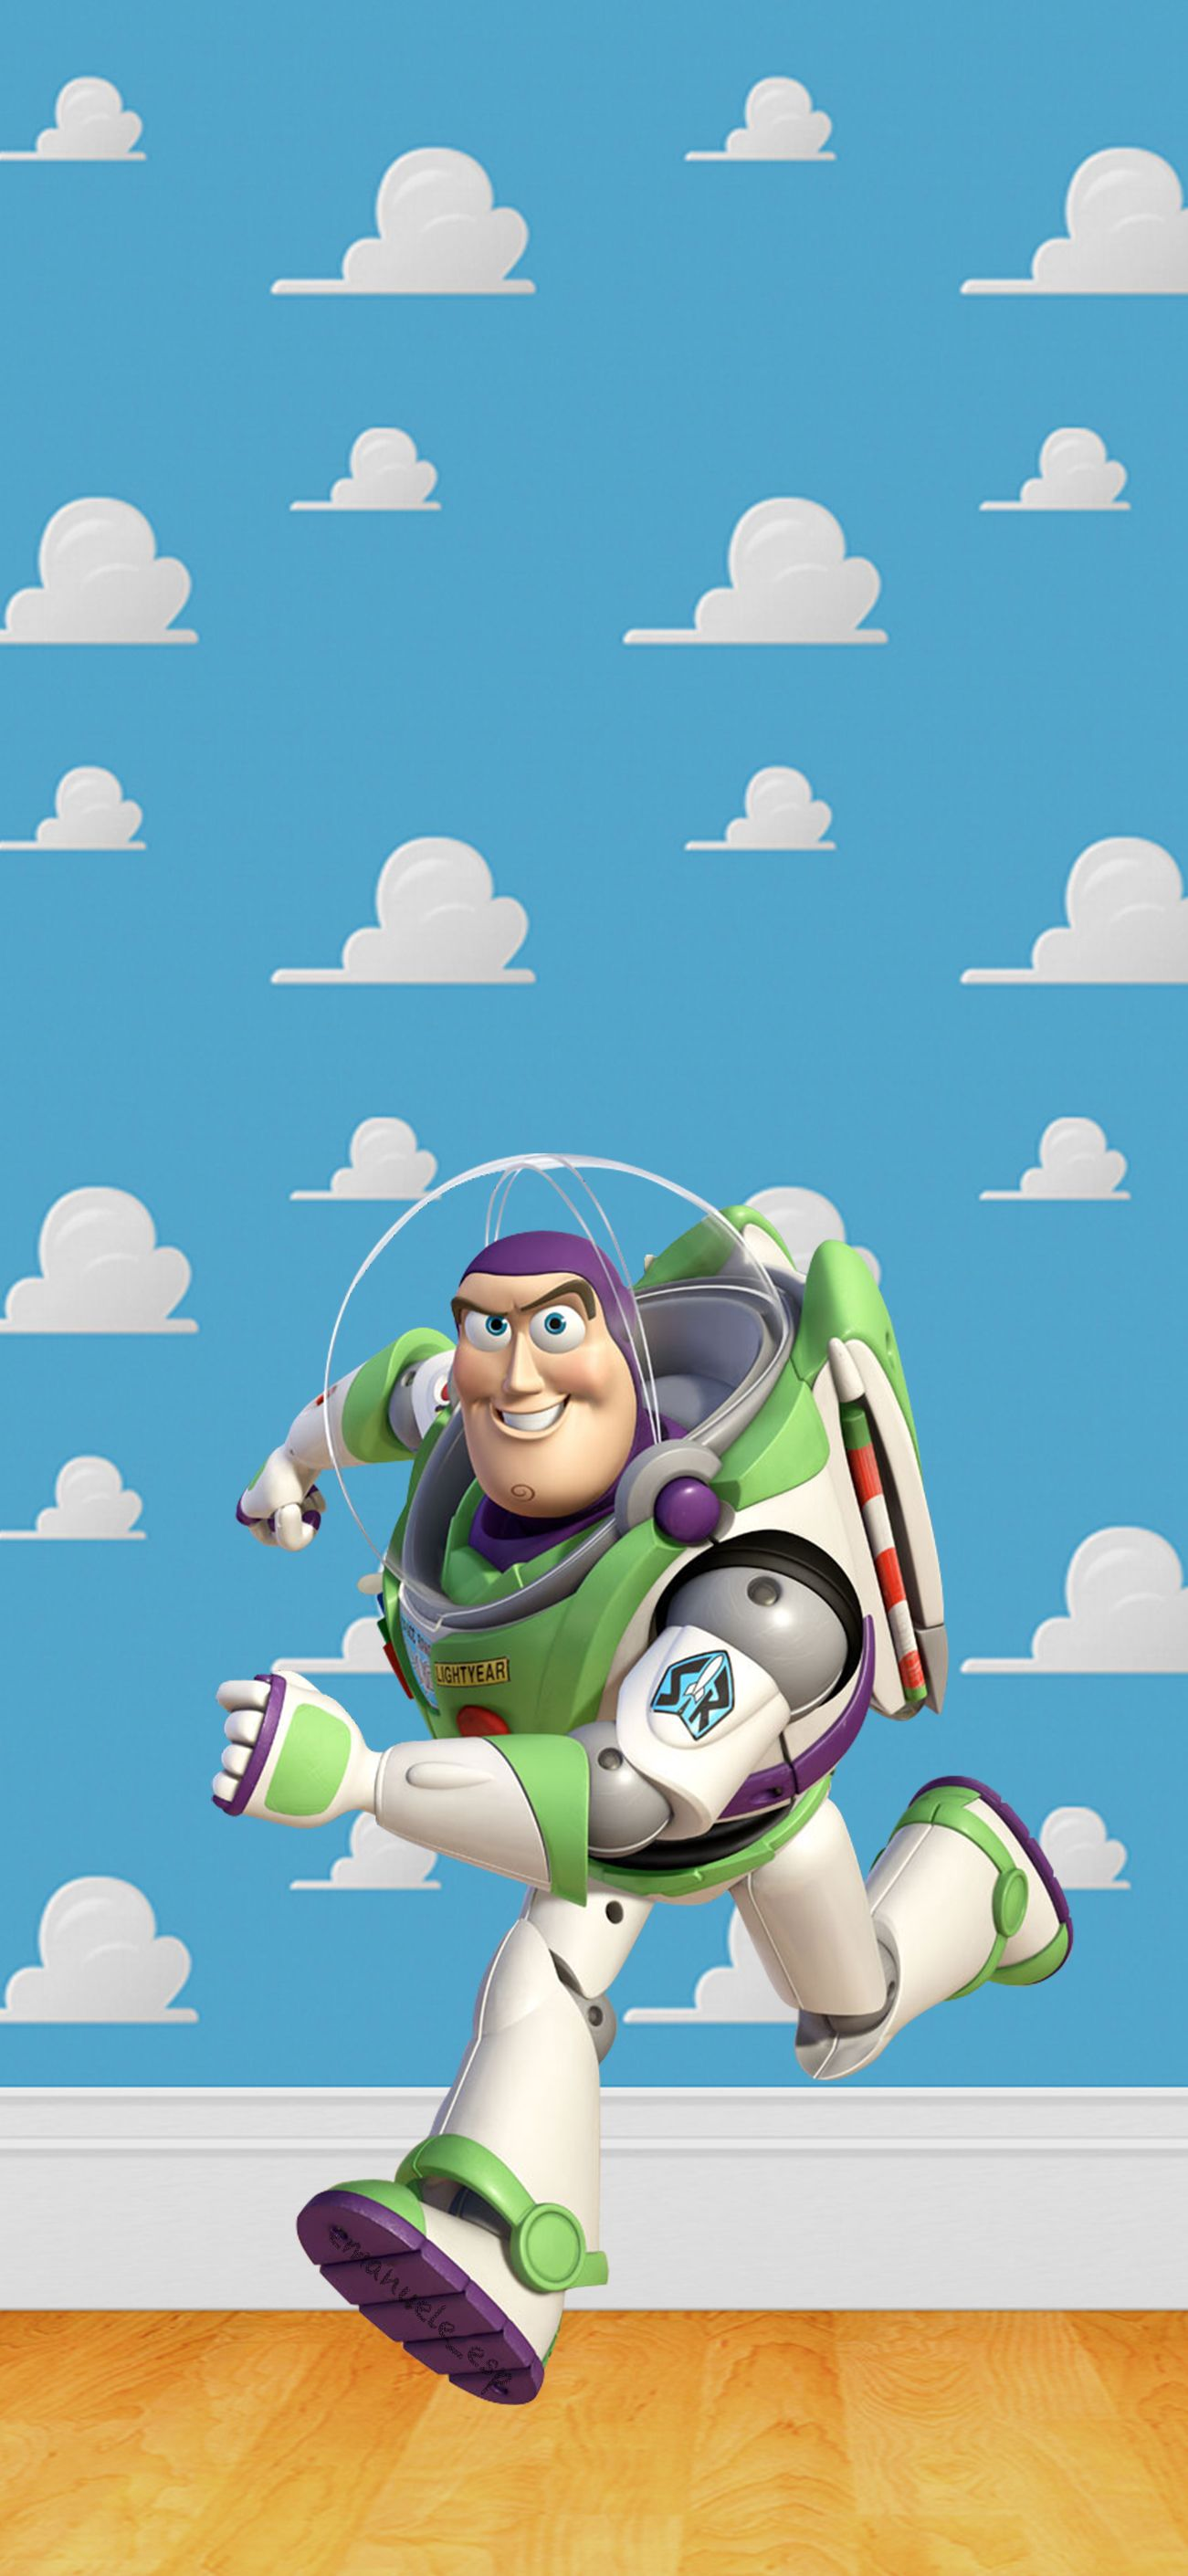 Buzz Lightyear Wallpapers Top Free Buzz Lightyear